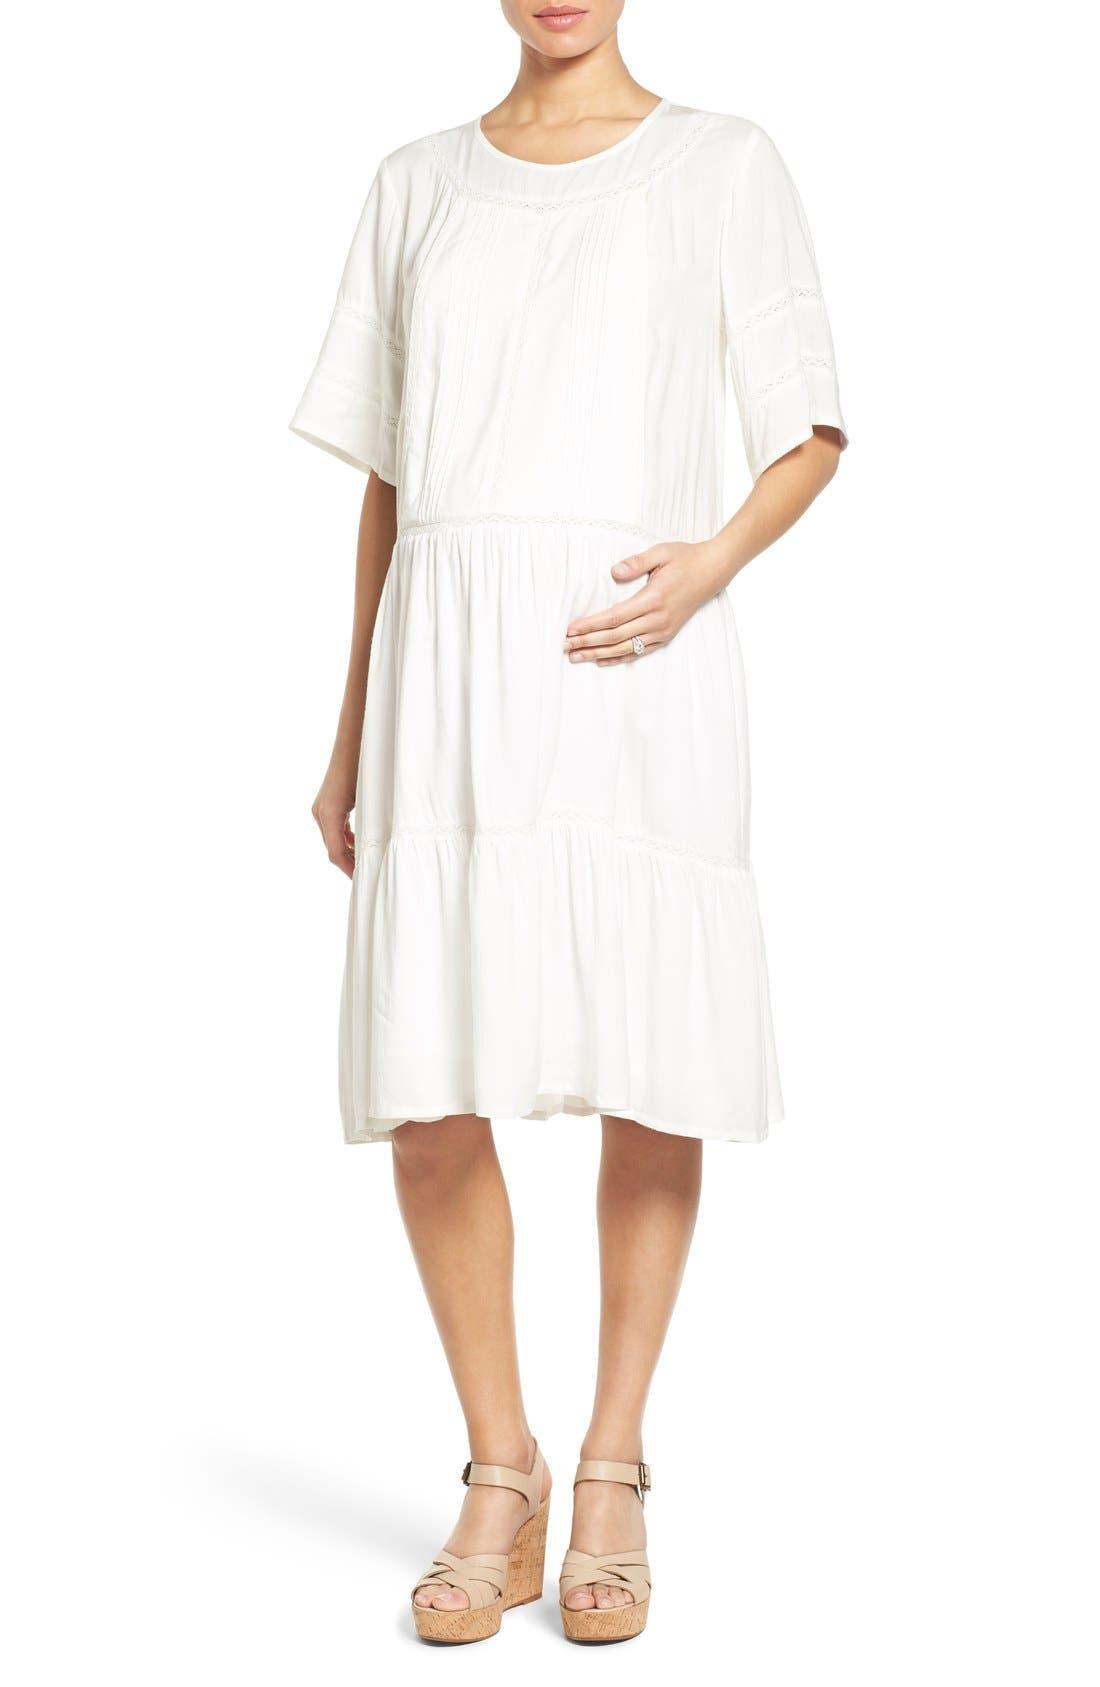 Alternate Image 1 Selected - Fillyboo 'Wild at Heart' Maternity/Nursing Midi Dress